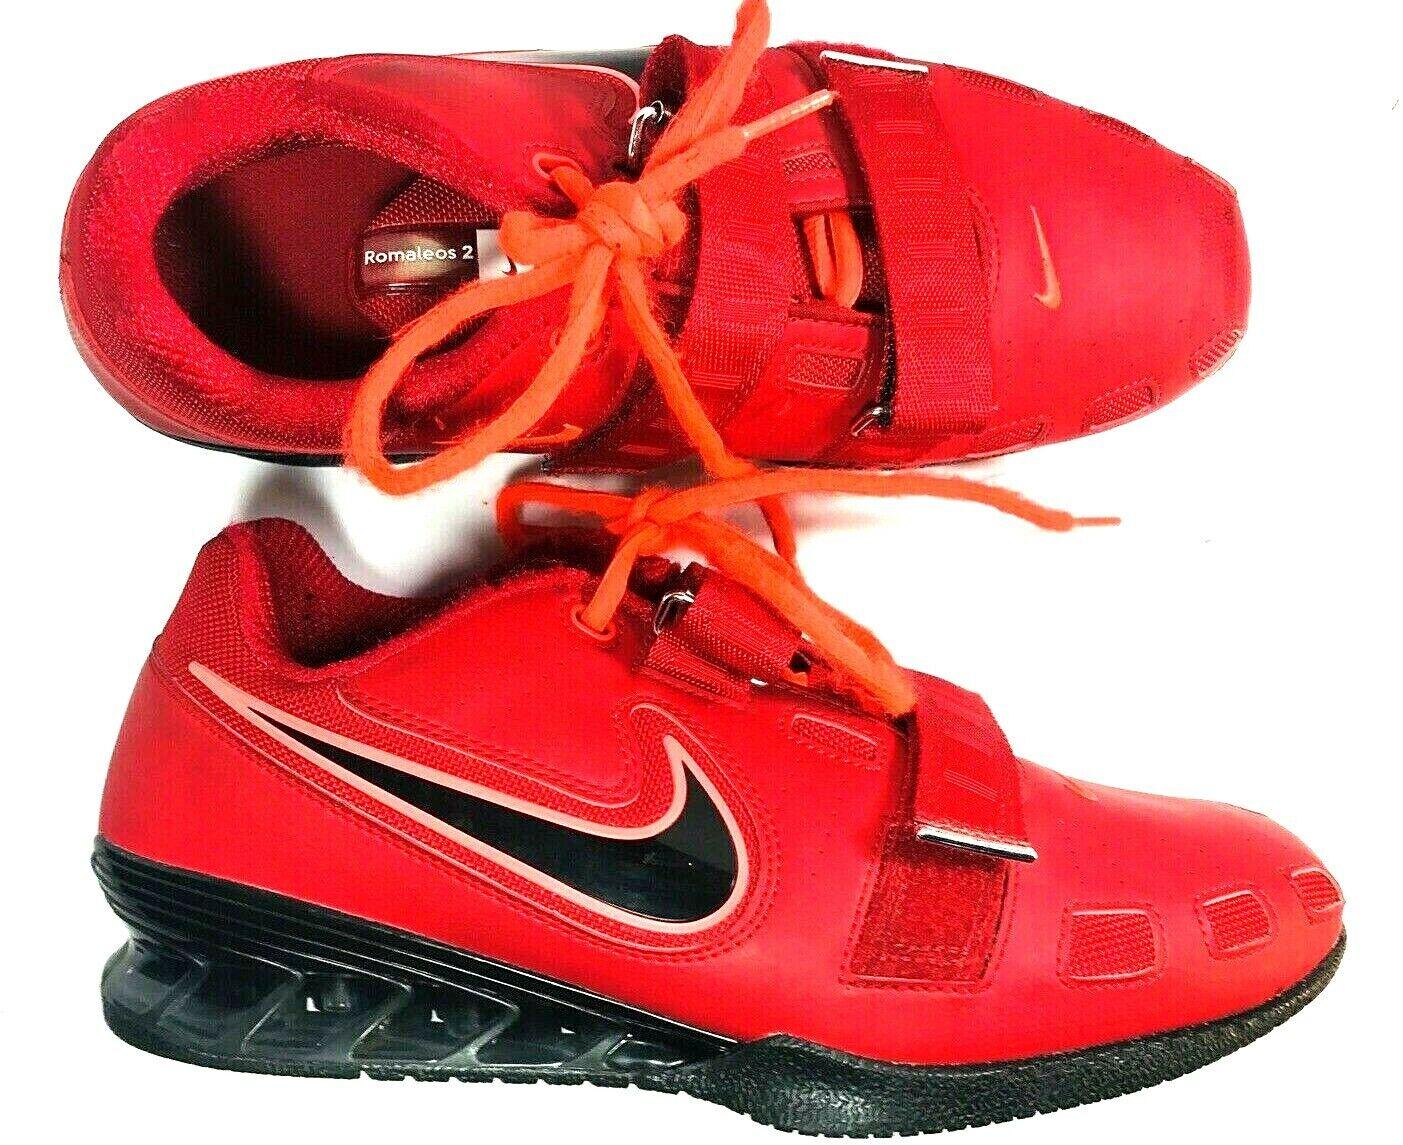 Nike Romaleos II 2 Mens Varsity Red Black Weightlifting shoes Sz 11 476927-670